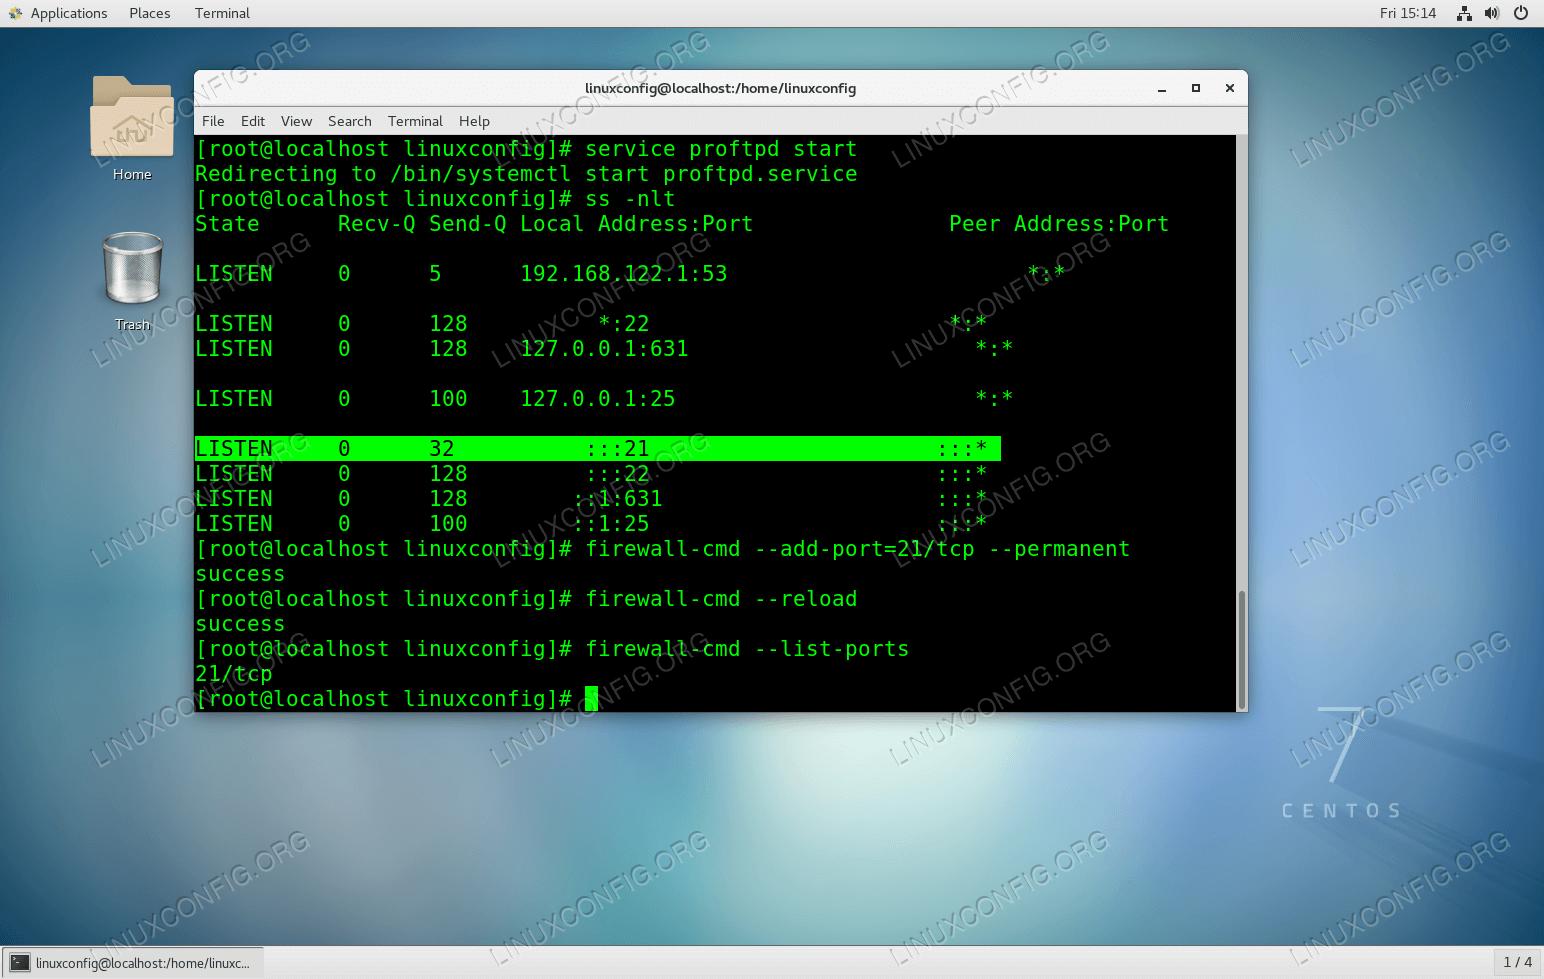 Configuring Basig FTP server using ProFTPD on CentOS 7